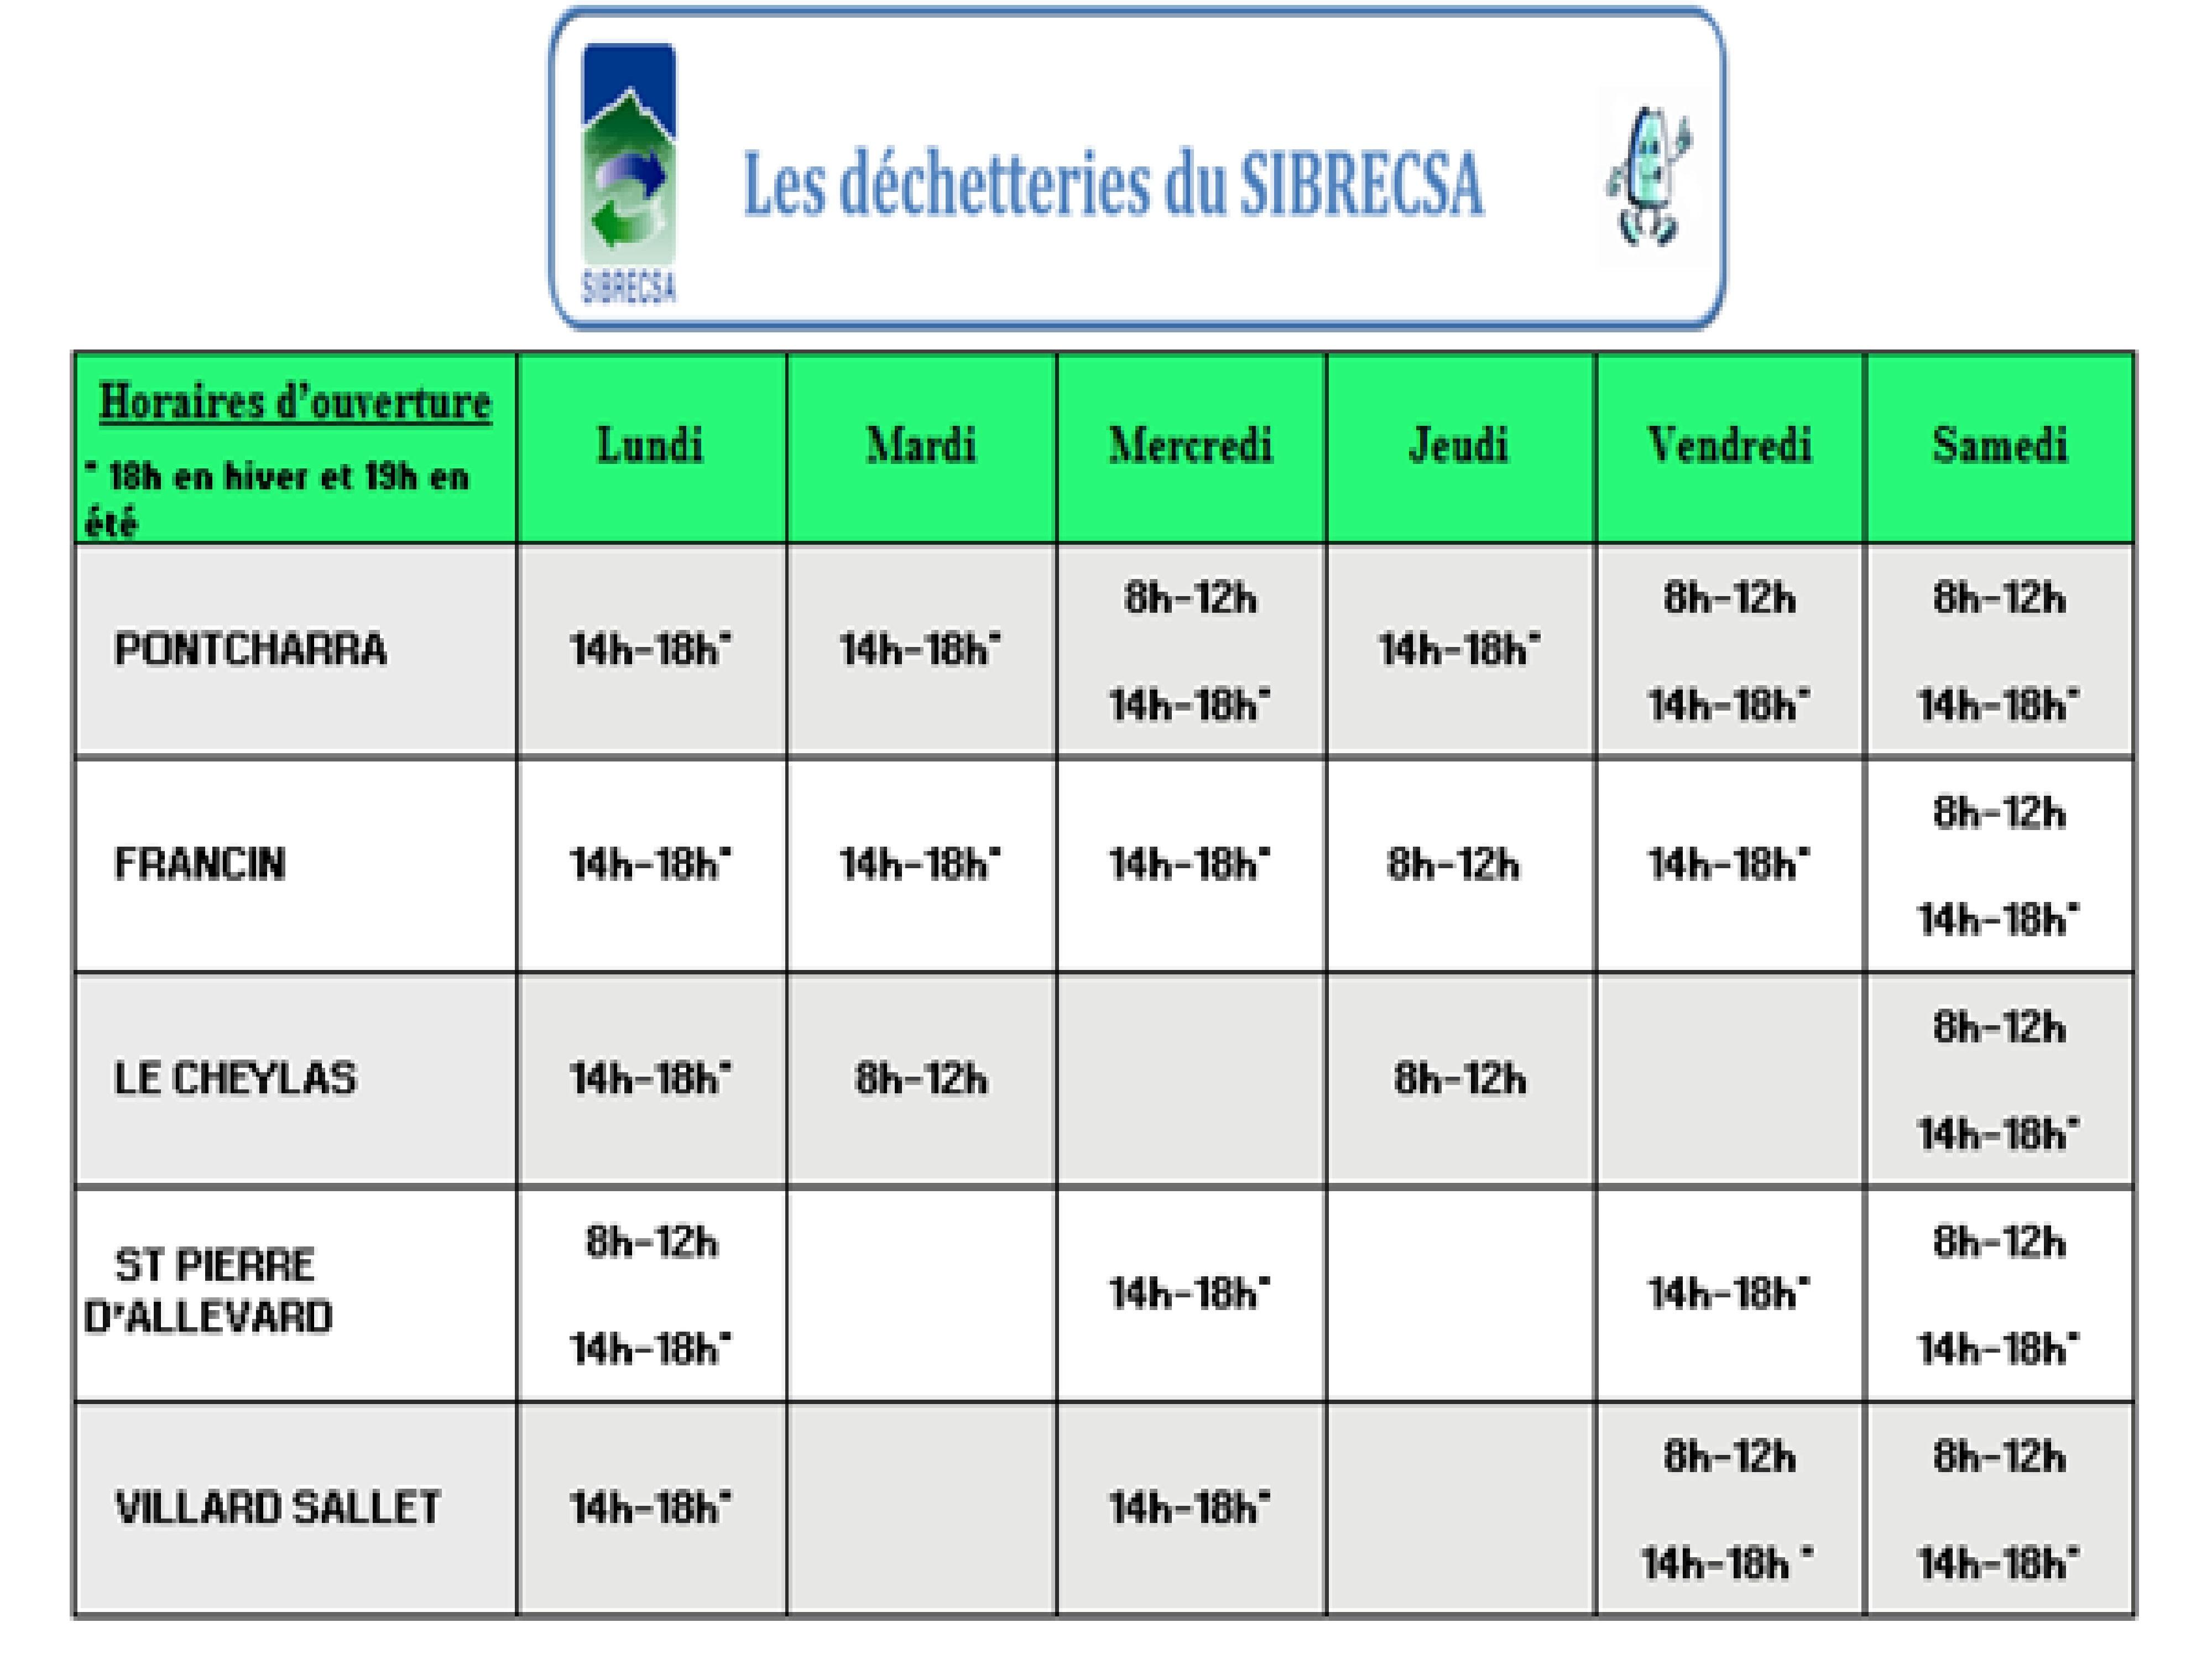 dechetteries-2